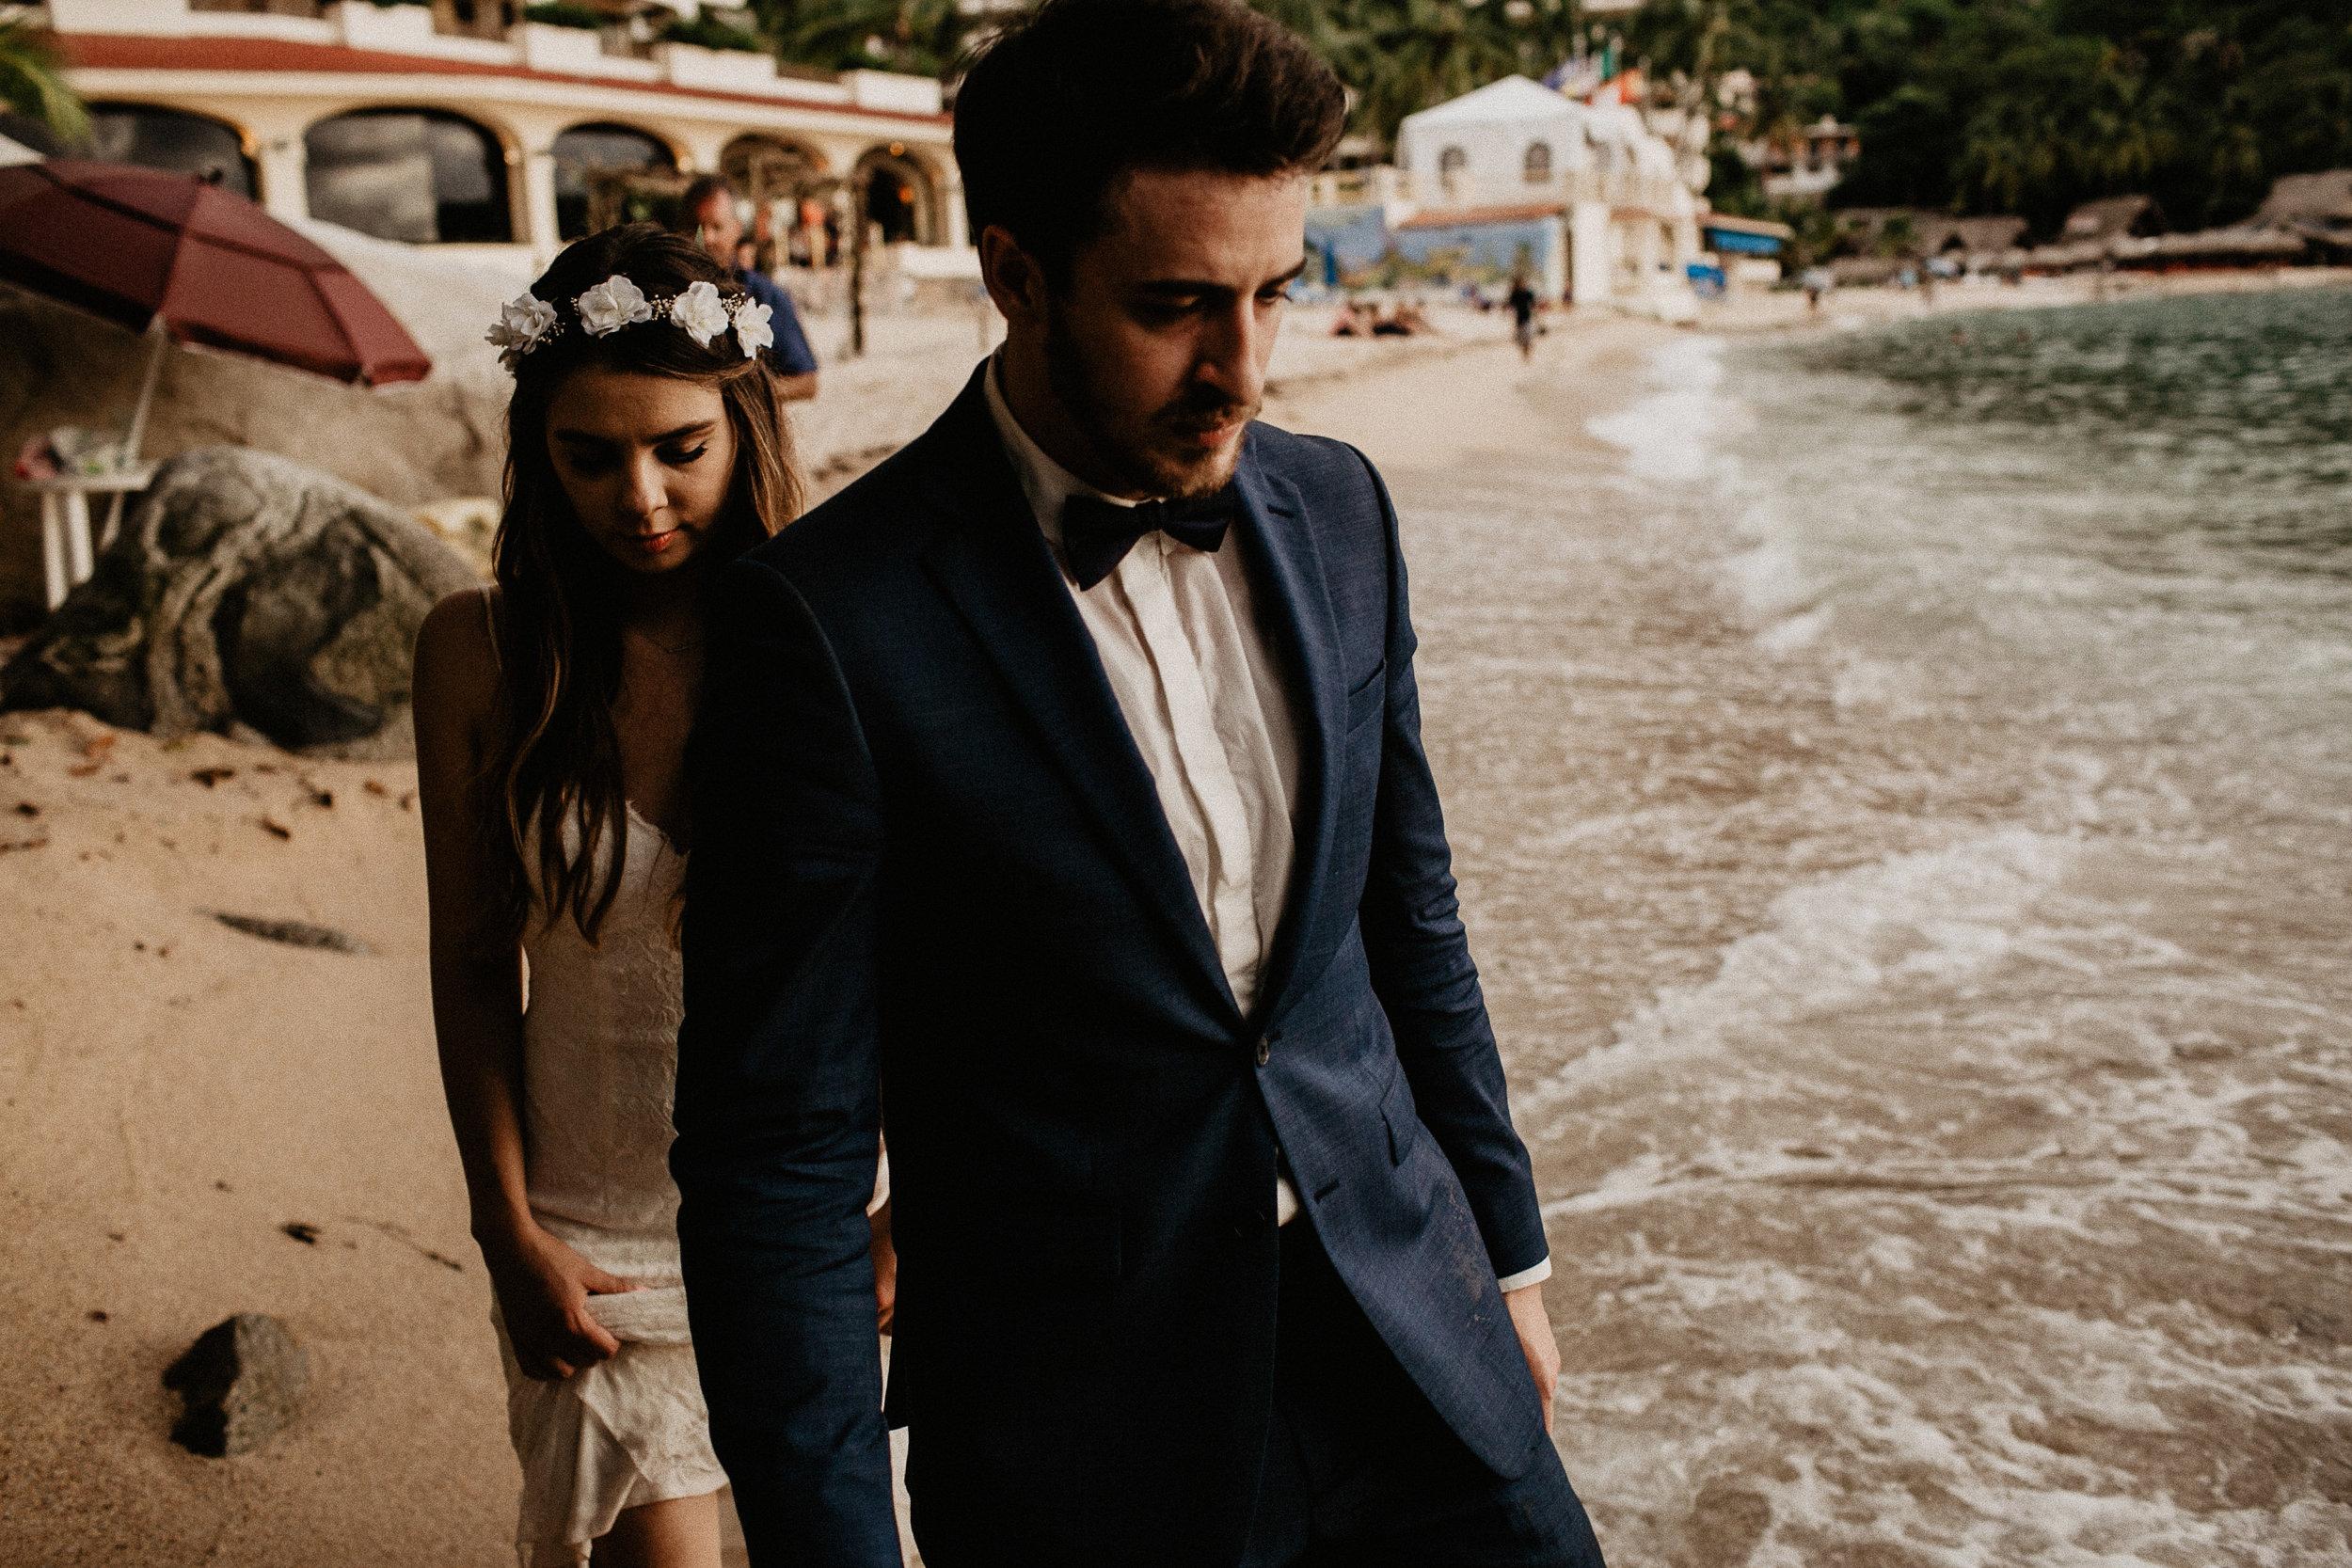 alfonso_flores_destination_wedding_photography_puerto_vallarta_hotel_barcelo_vallarta_cuttler_amela-731.JPG